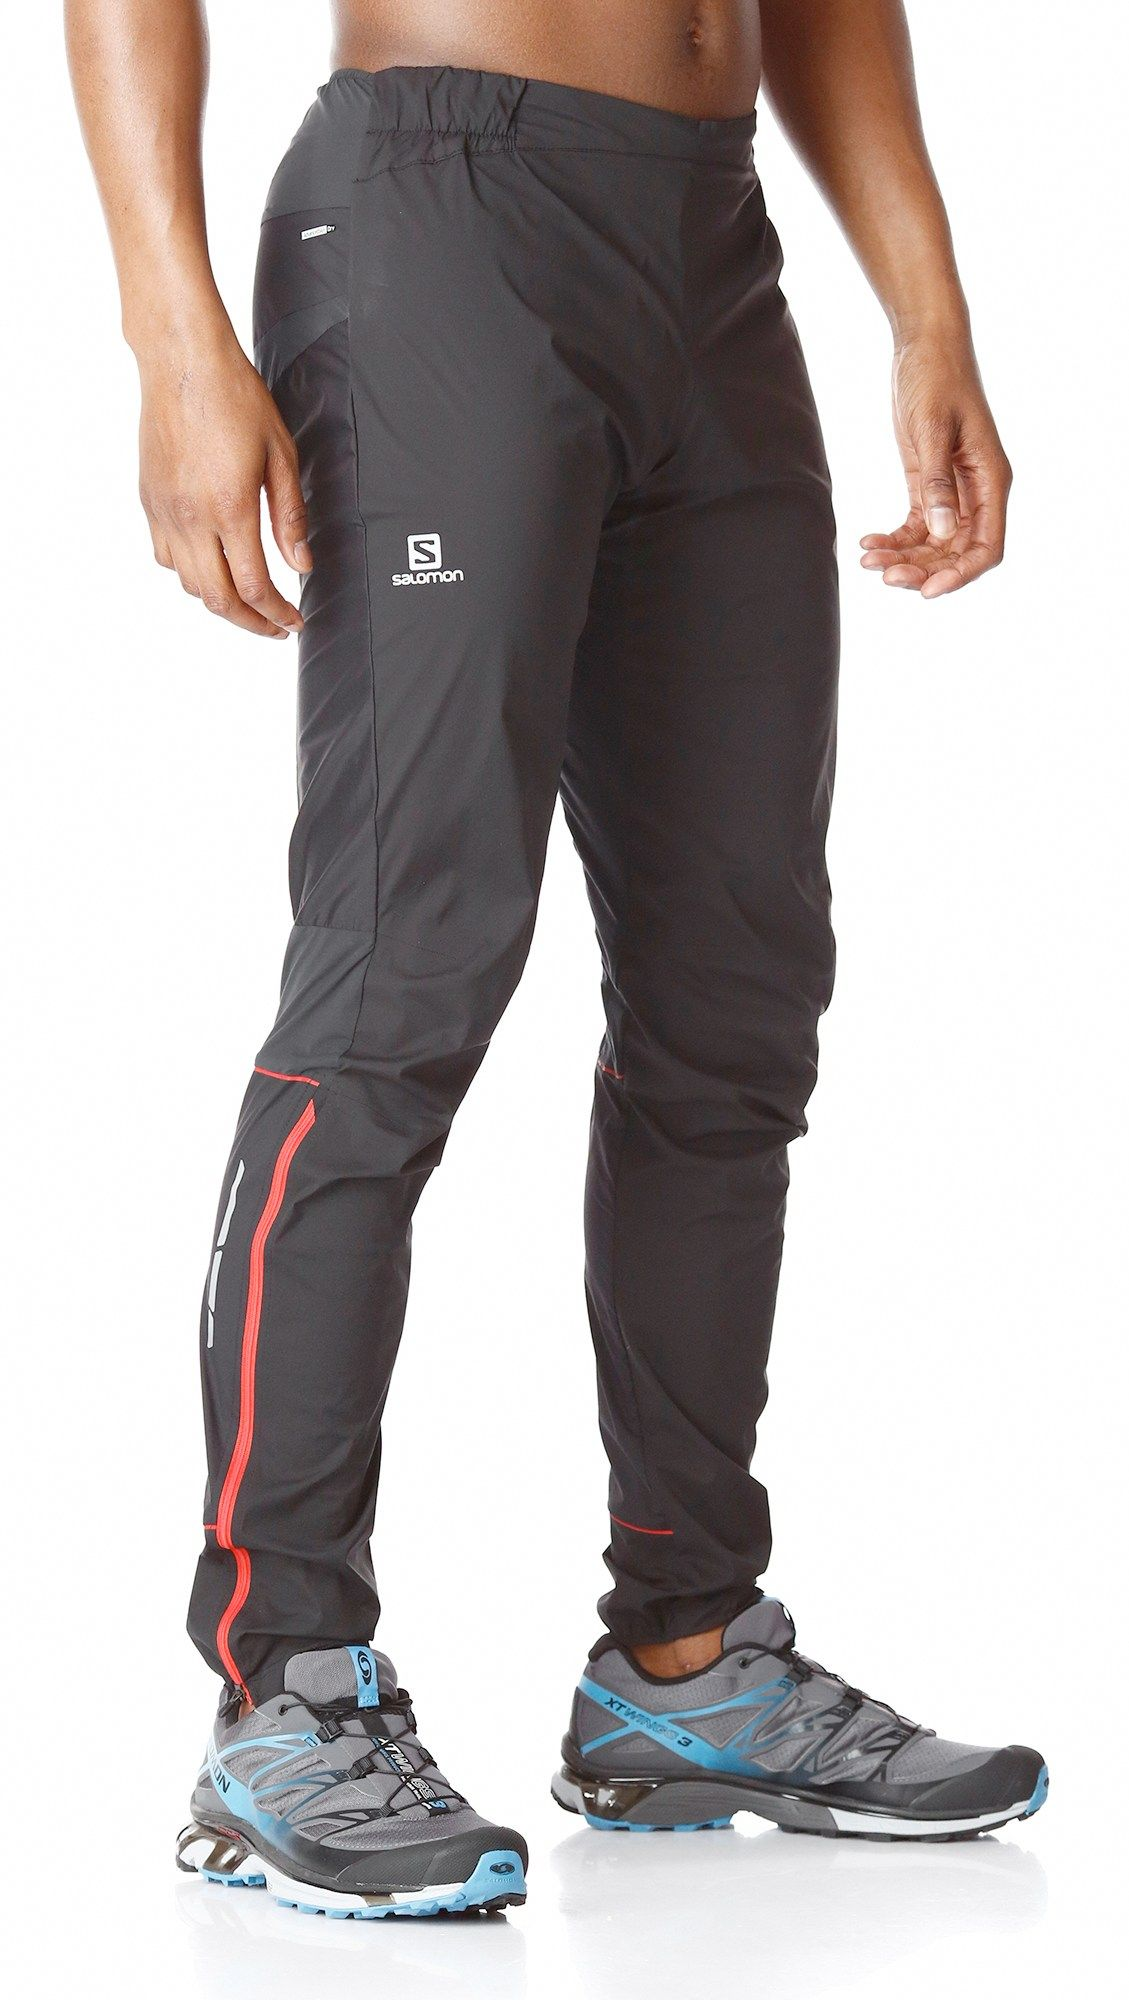 ebe14262 Salomon Male S-Lab Hybrid Wp Pants - Men's | *Apparel & Accessories ...